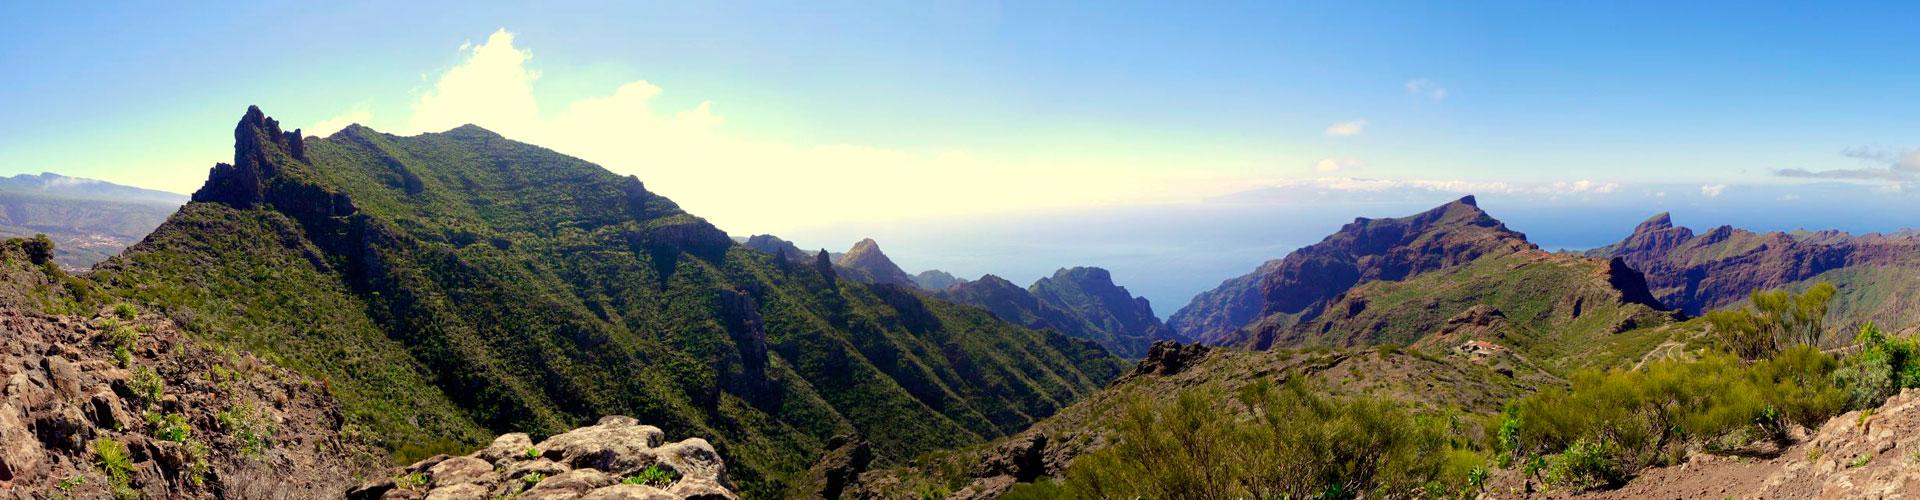 Masca Gorge Trekking